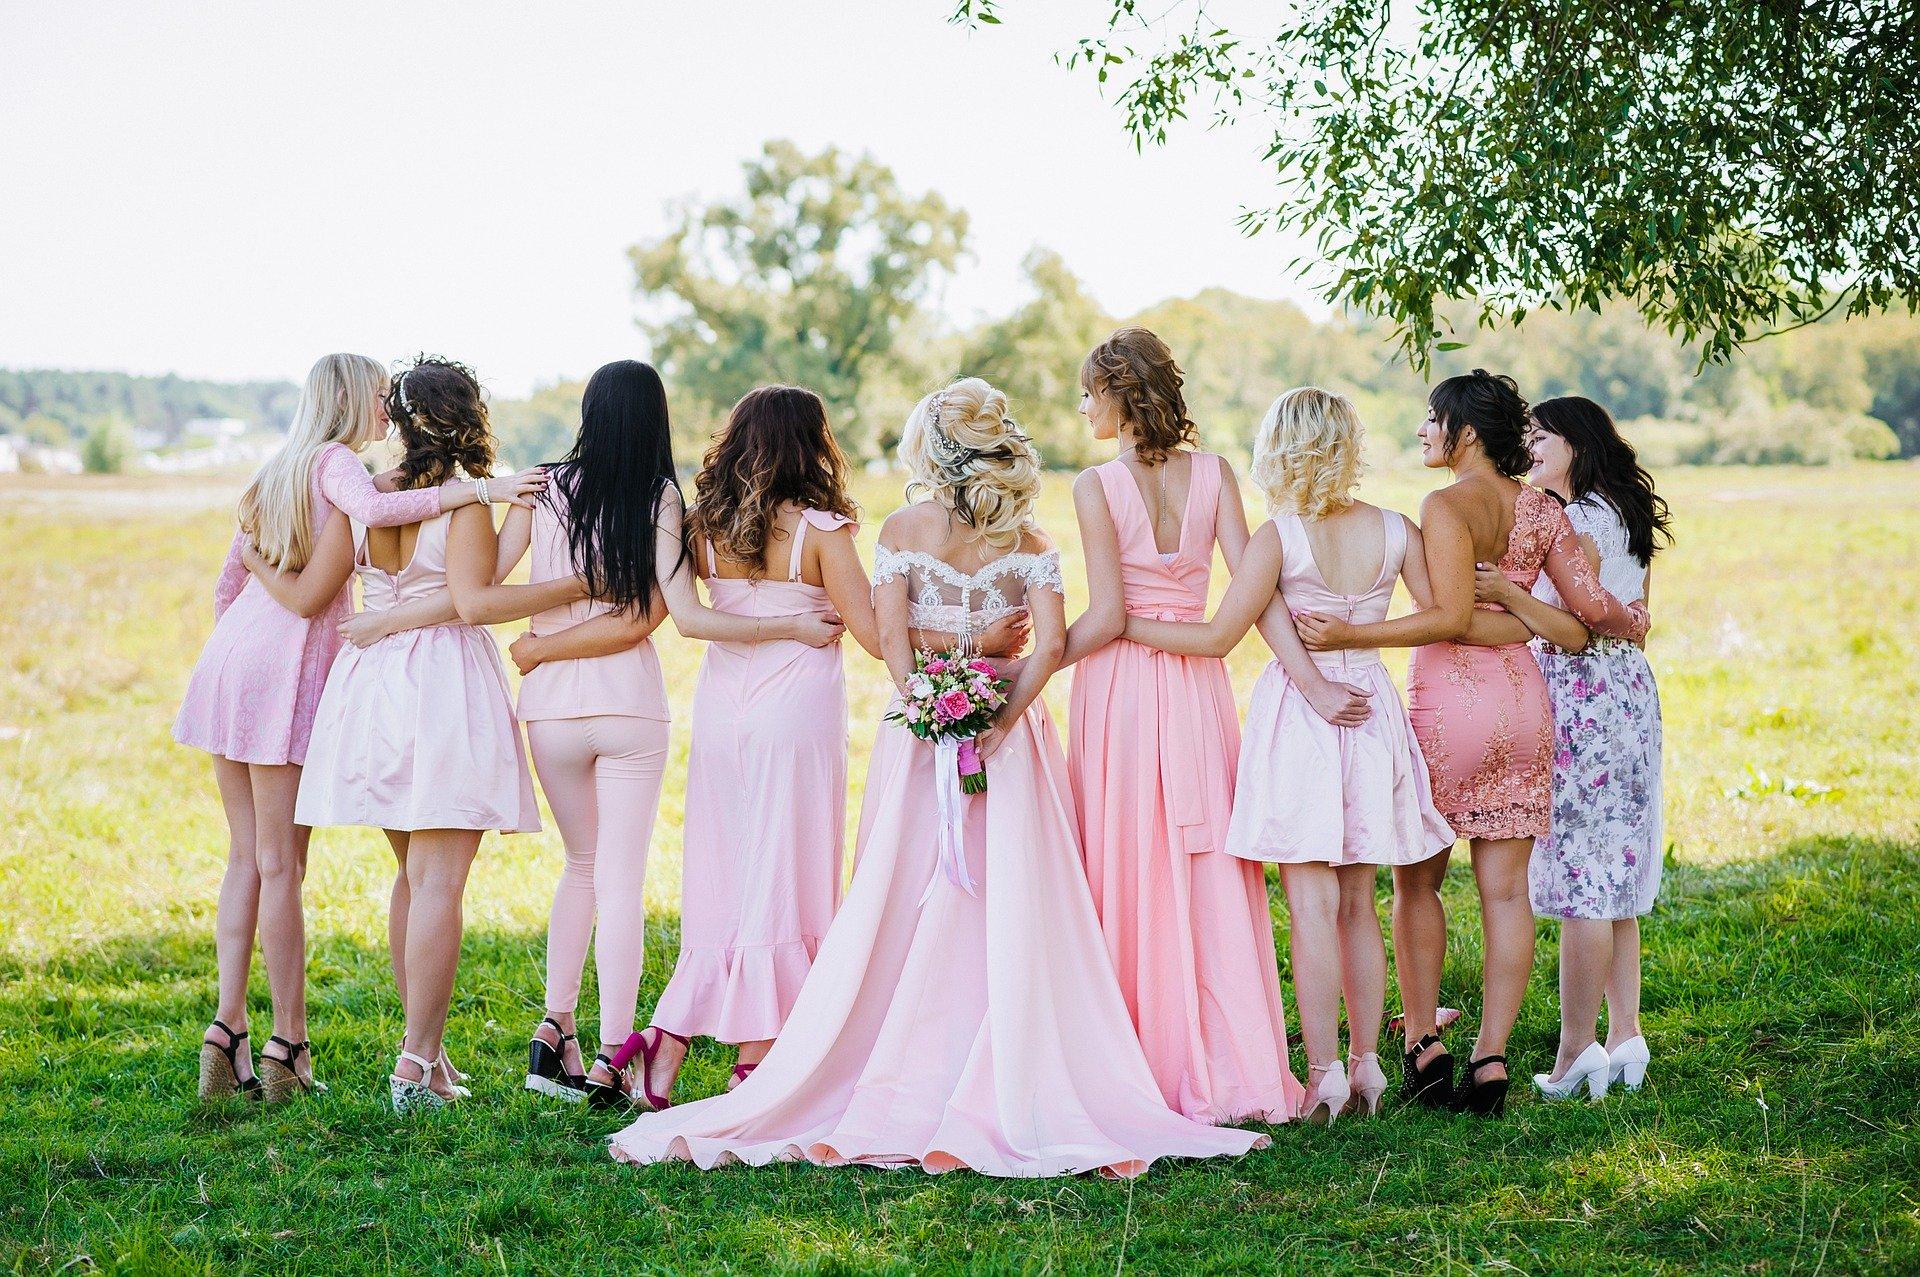 Wedding Services Melbourne